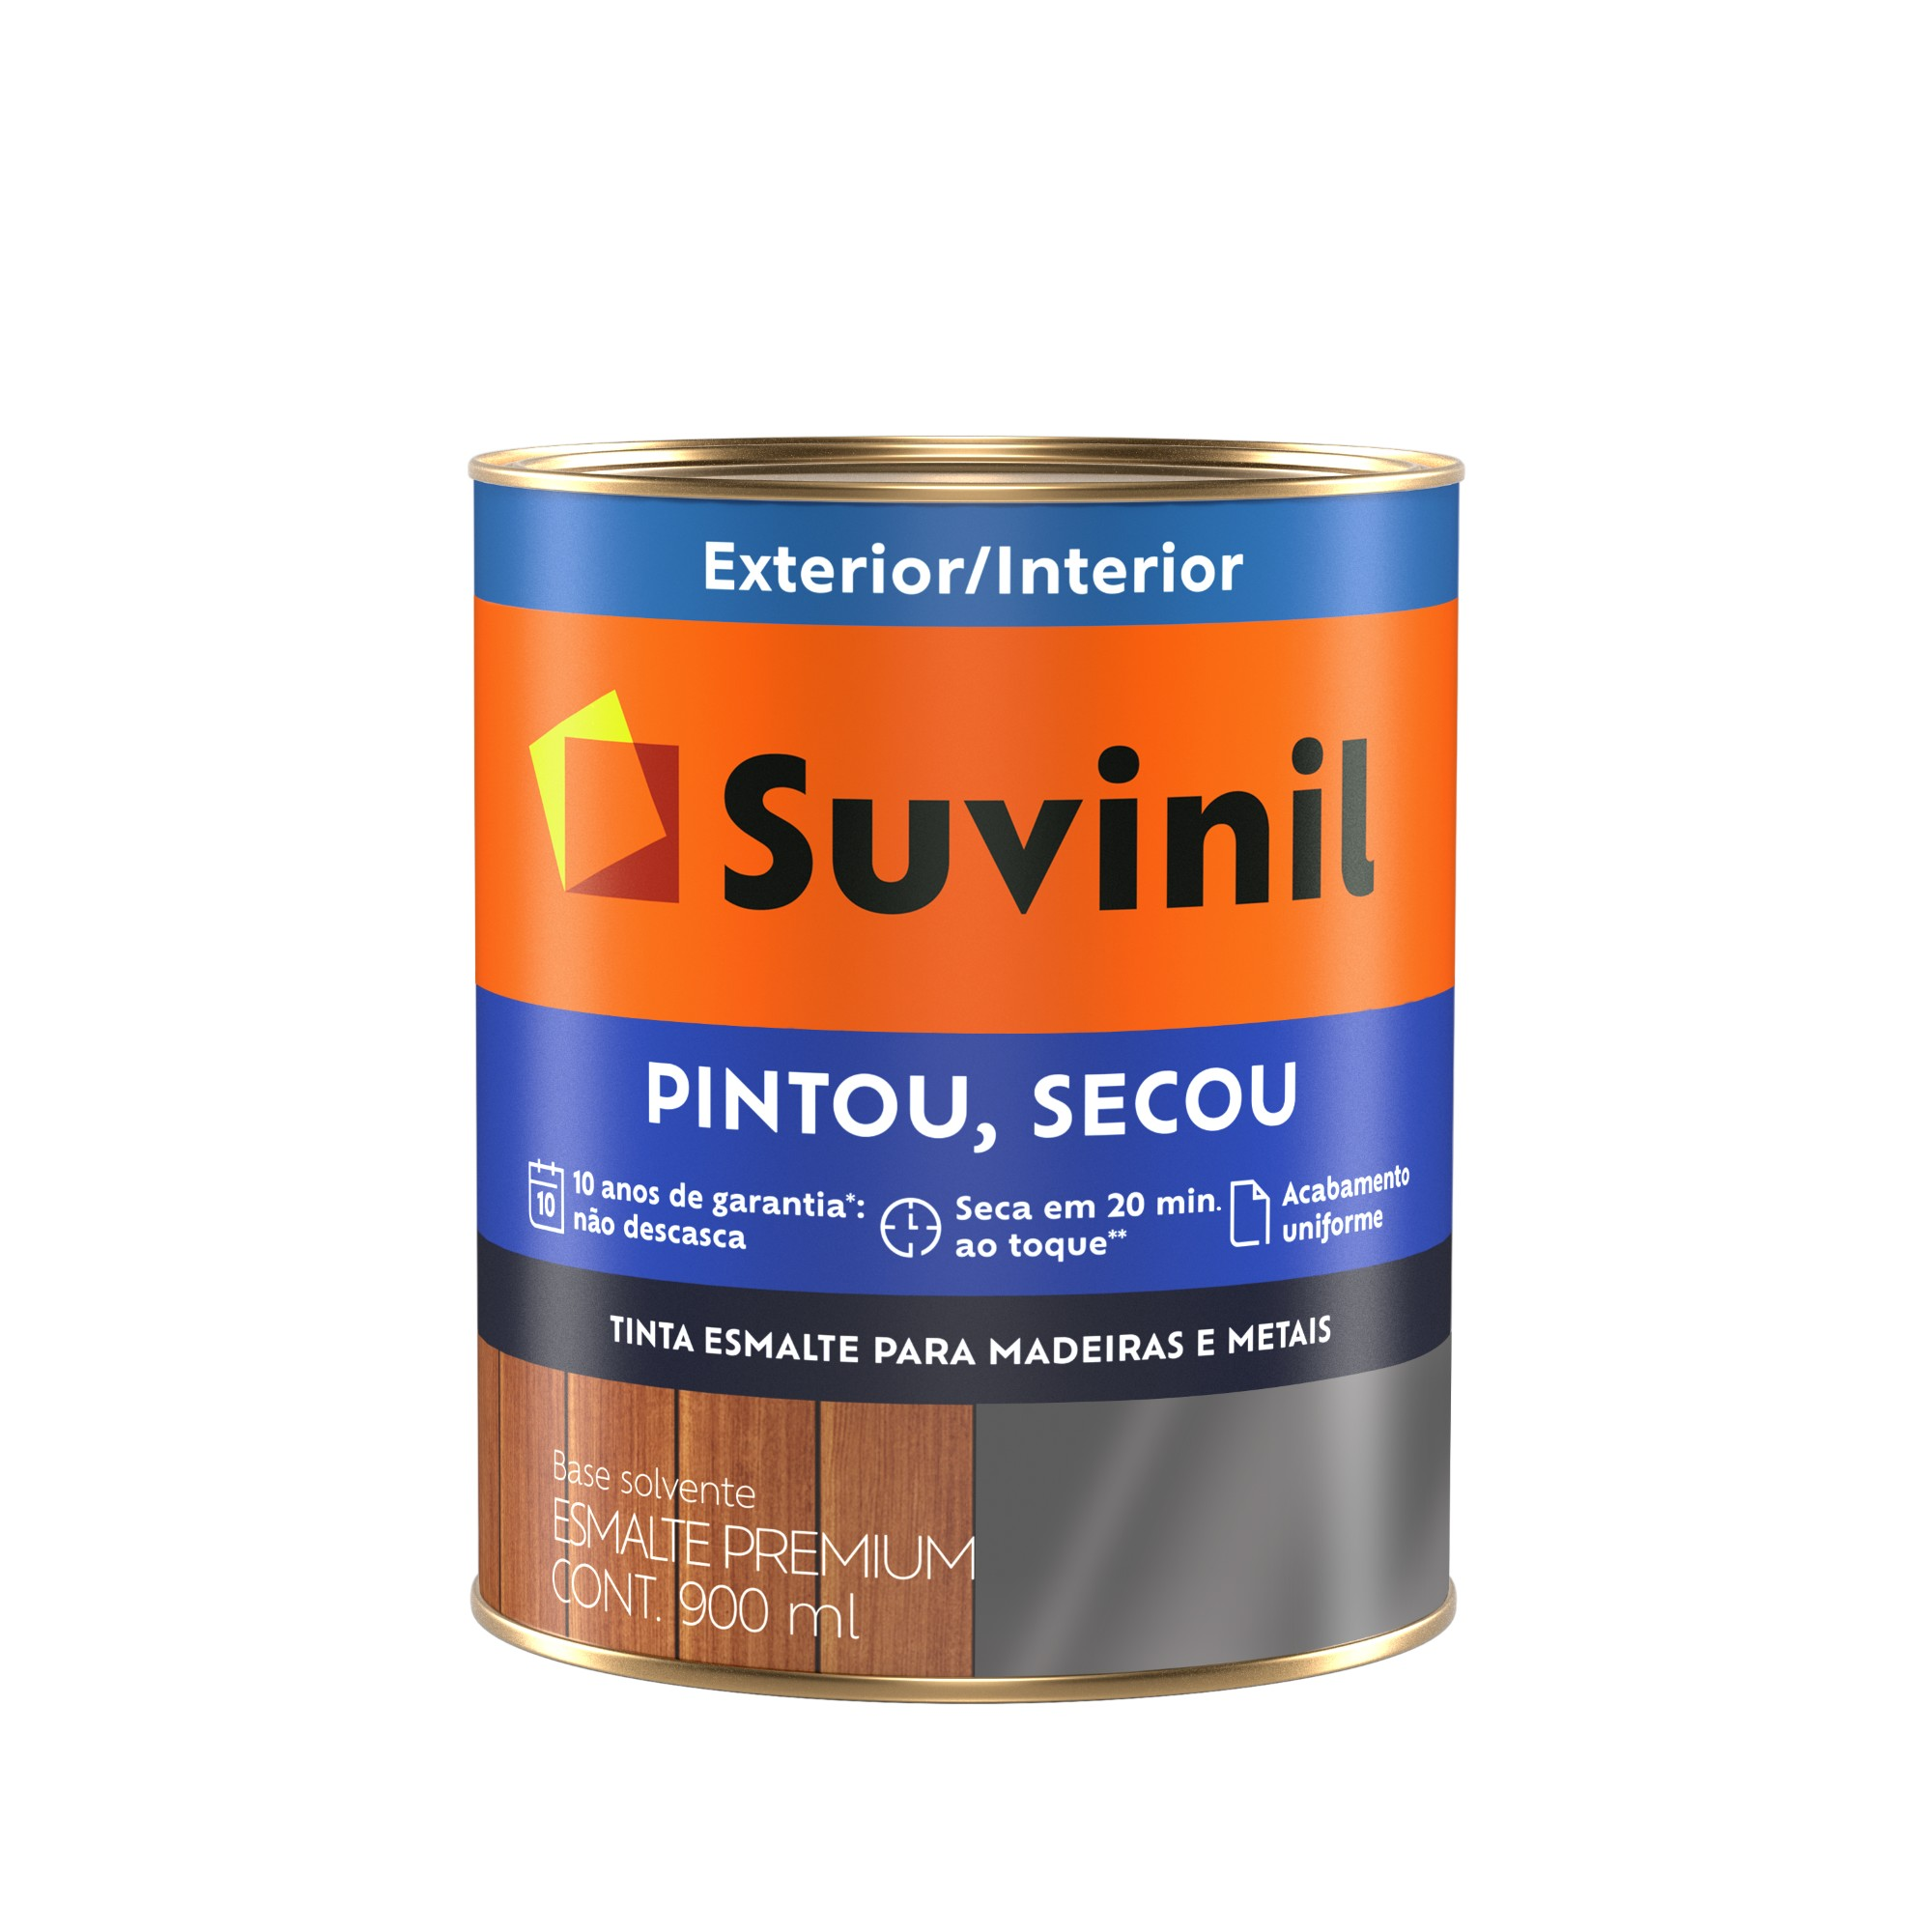 Tinta Esmalte Sintetico Brilhante Premium 09L - Petroleo - Pintou Secou Suvinil